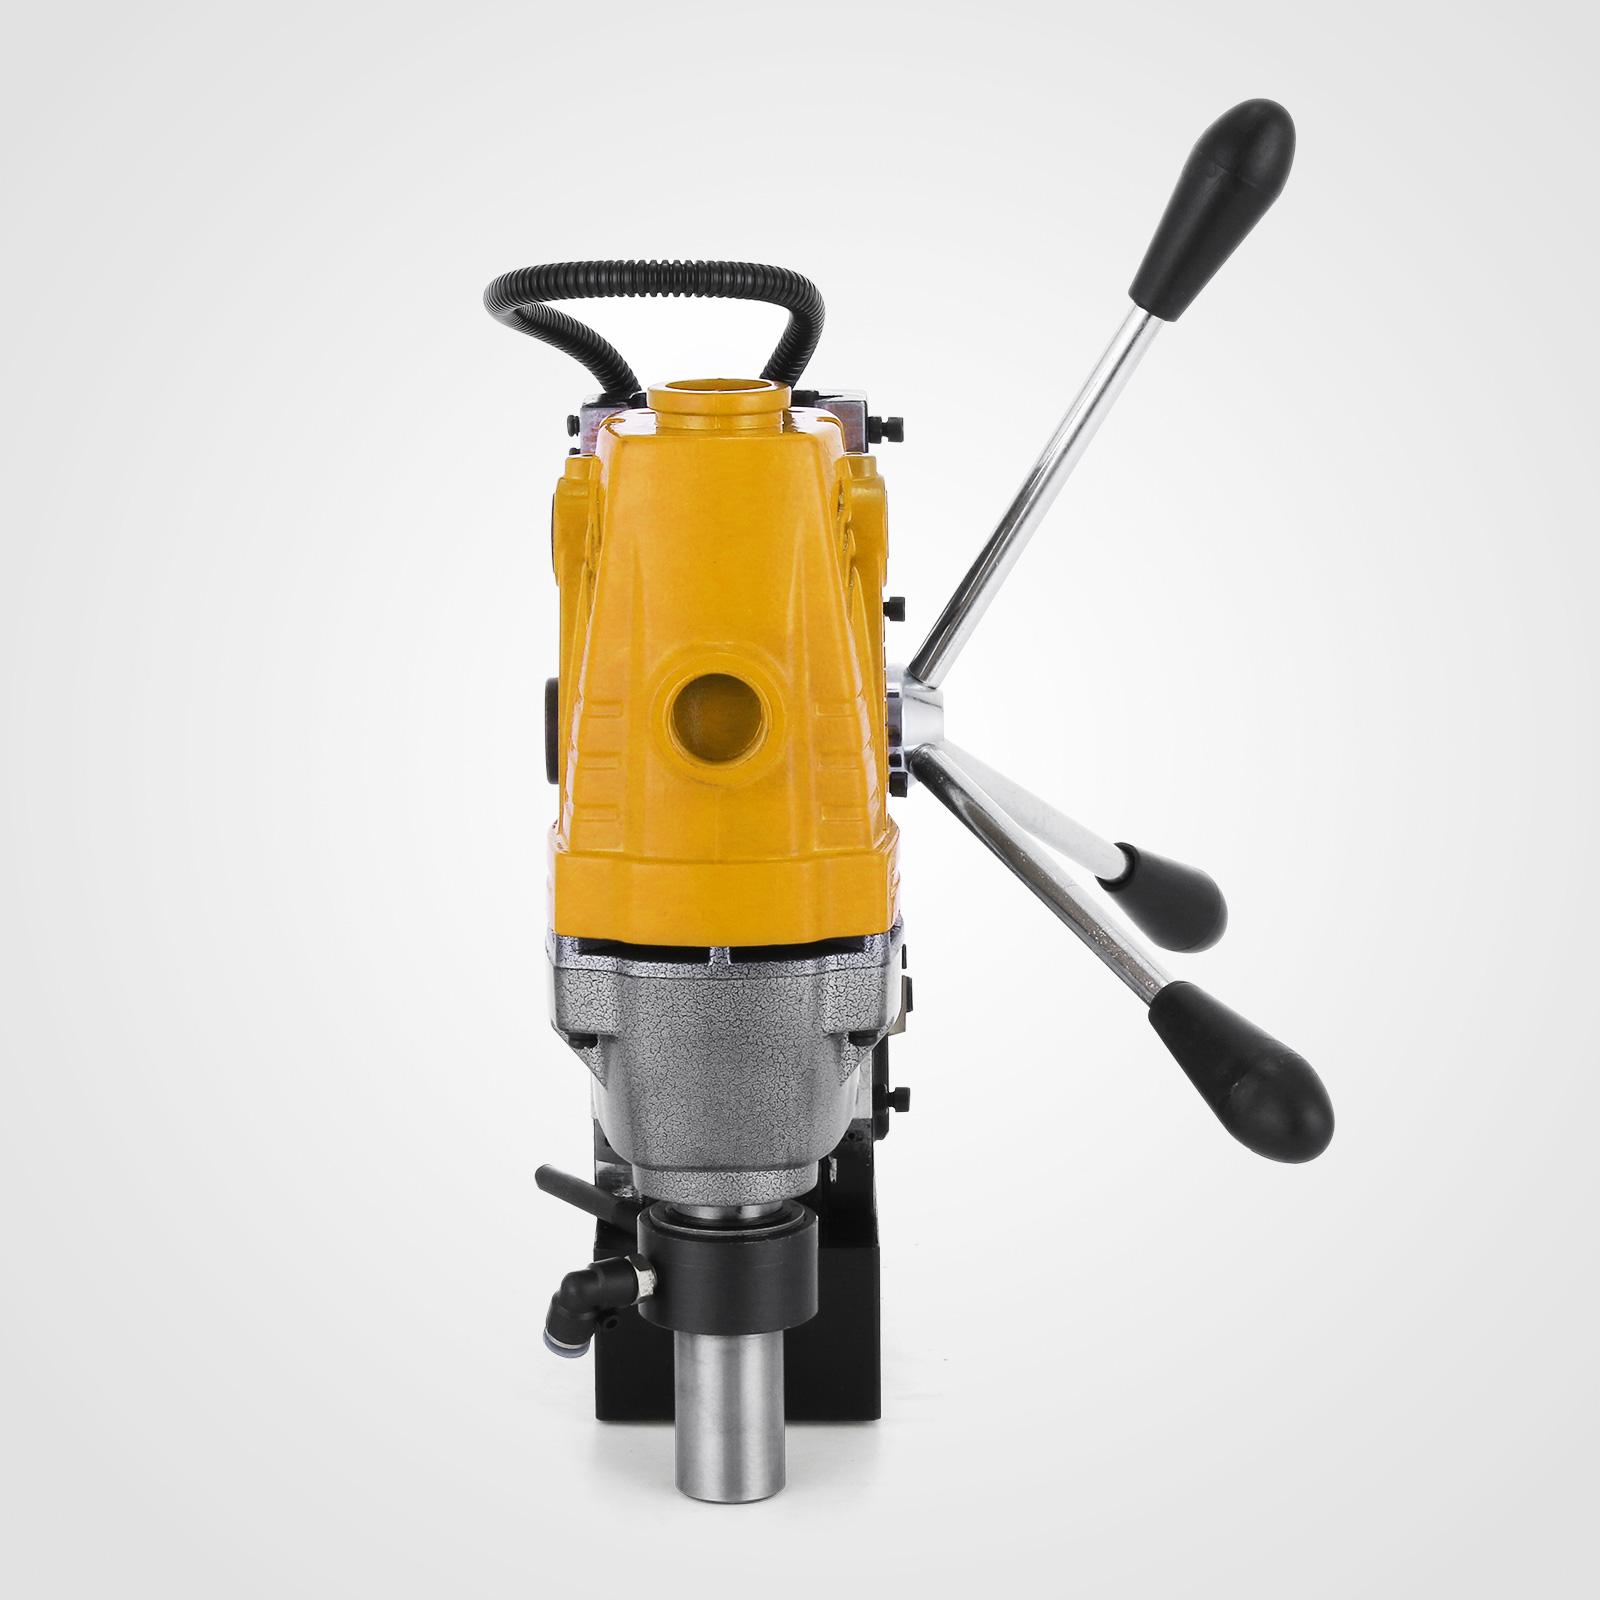 MB23-BRM35-MD40-Trapano-Perforatrice-Carotatore-Fresa-Magnetico-12-40mm-230V miniatura 31